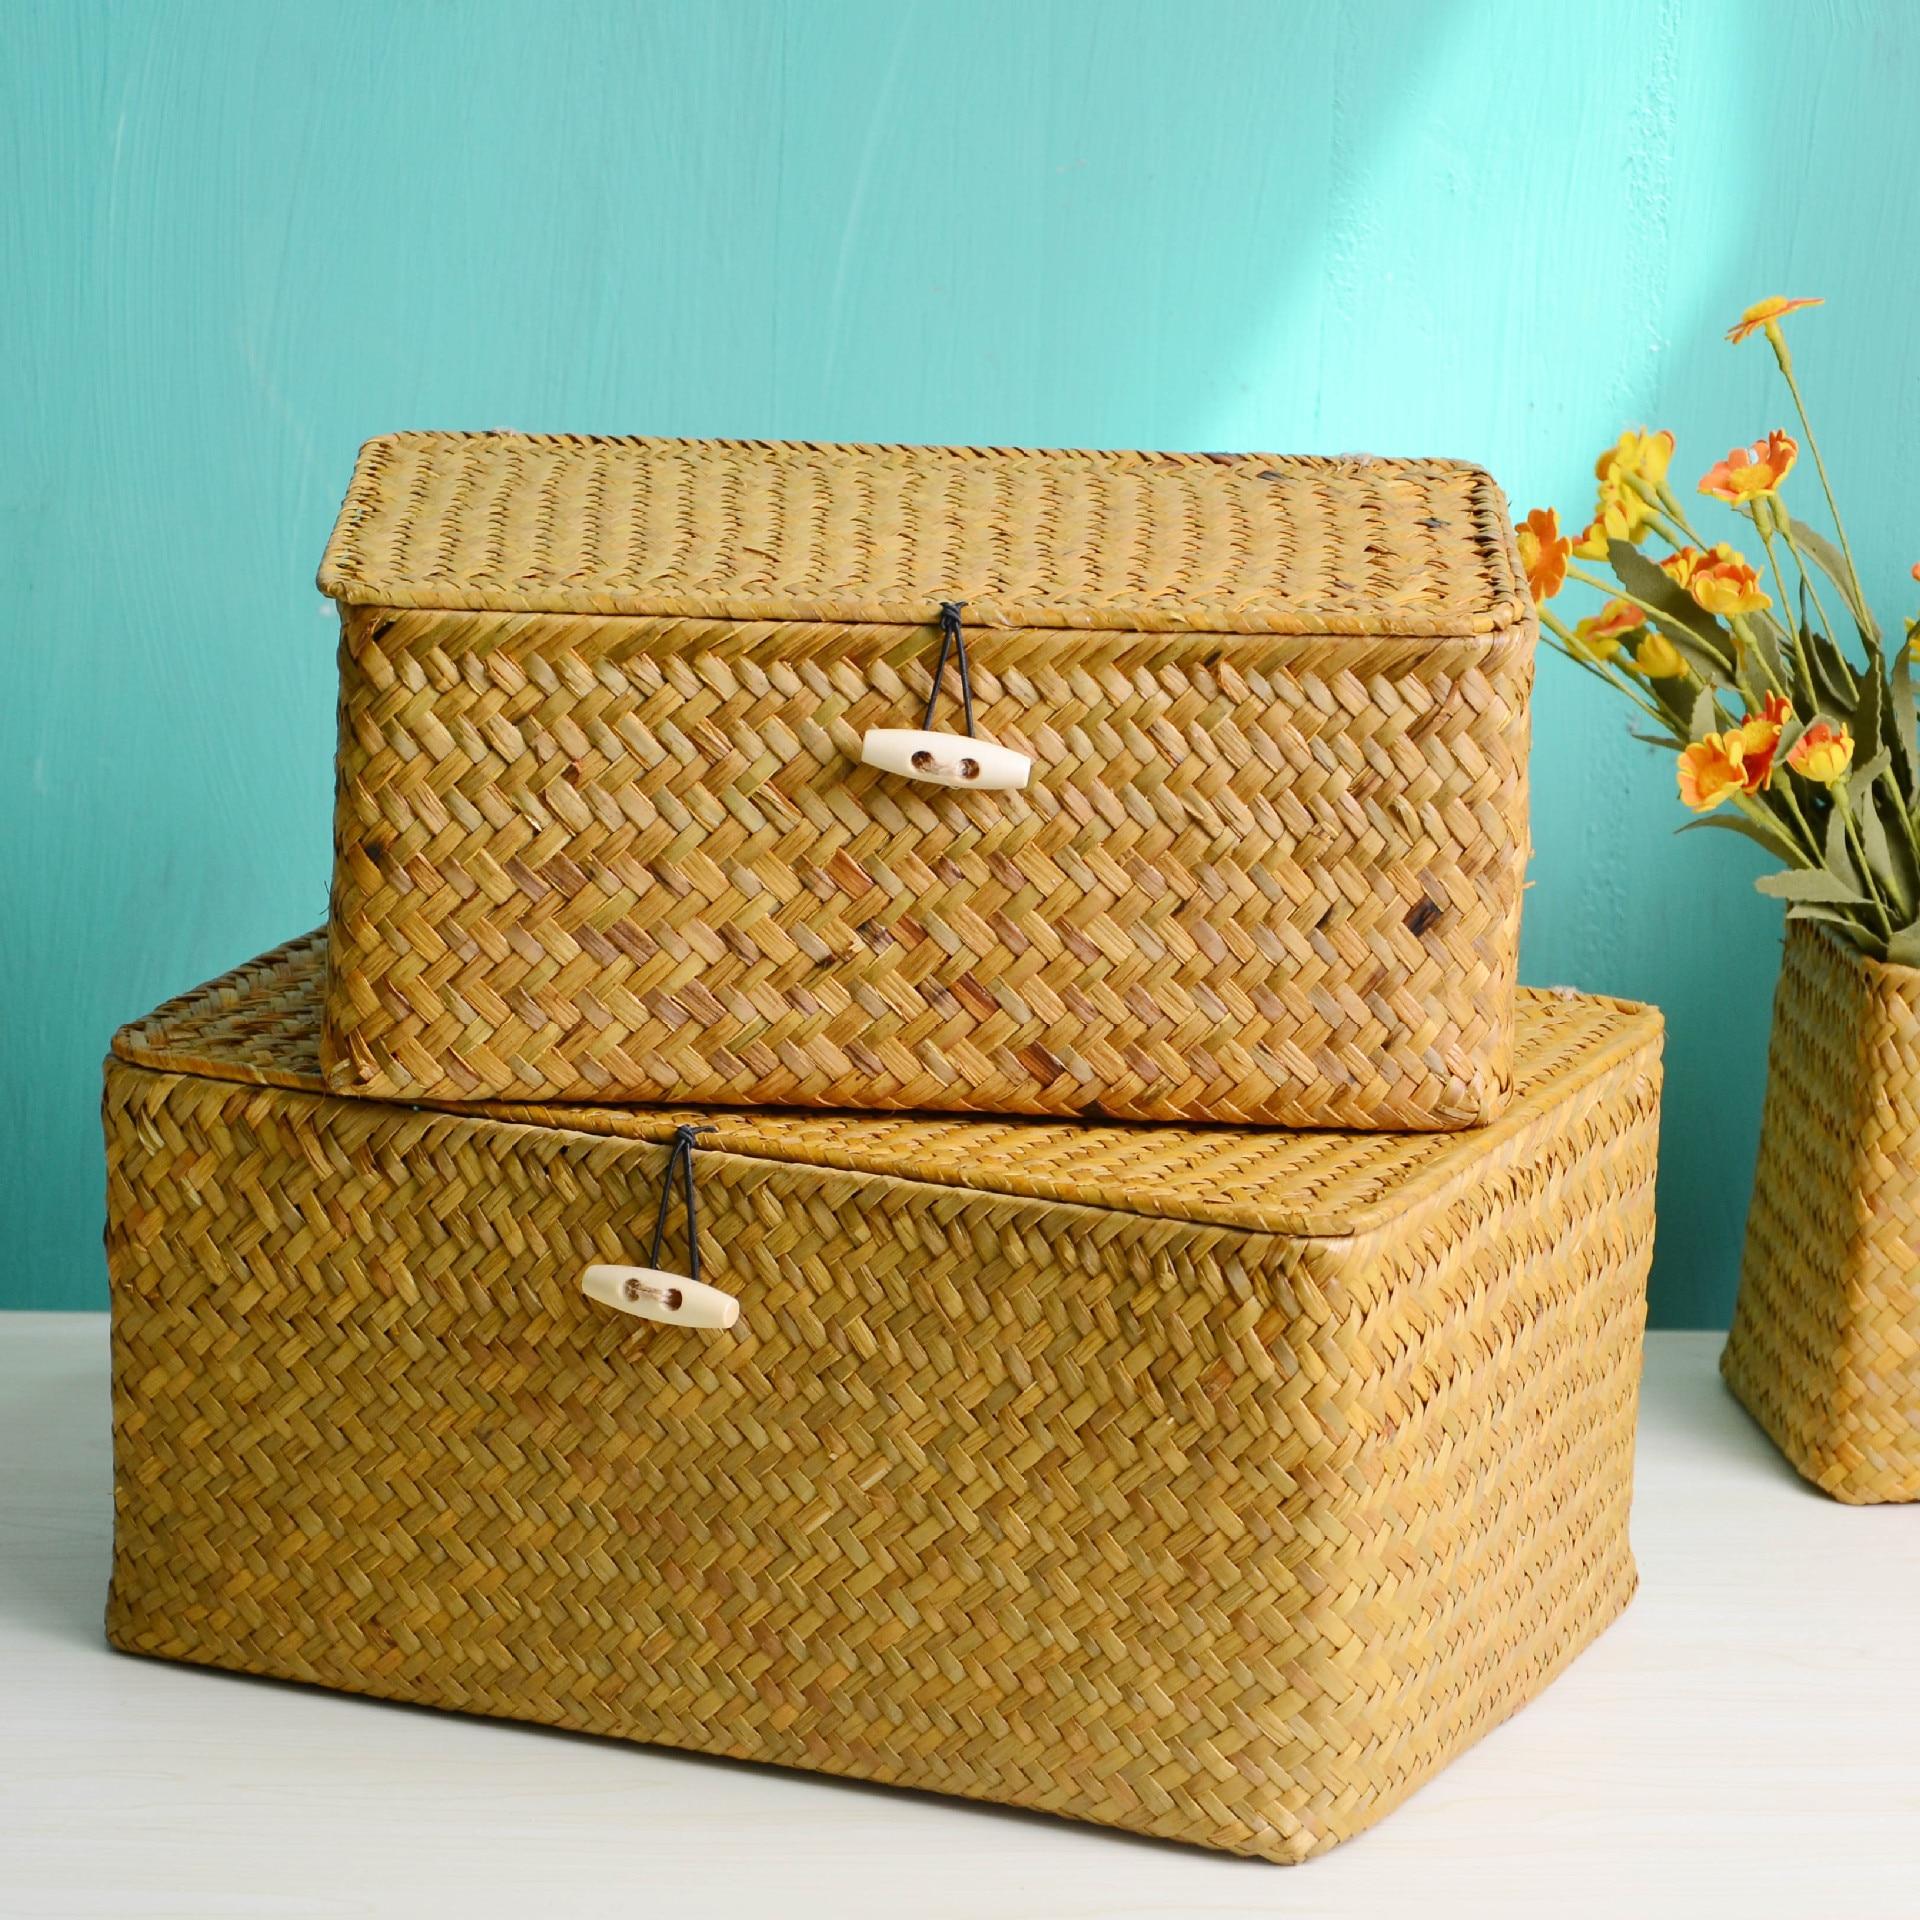 Handmade Rural Medium and Small Straw Storage Box Storage Basket Retro Rattan Crafts Gifts Home Decoration Accessories